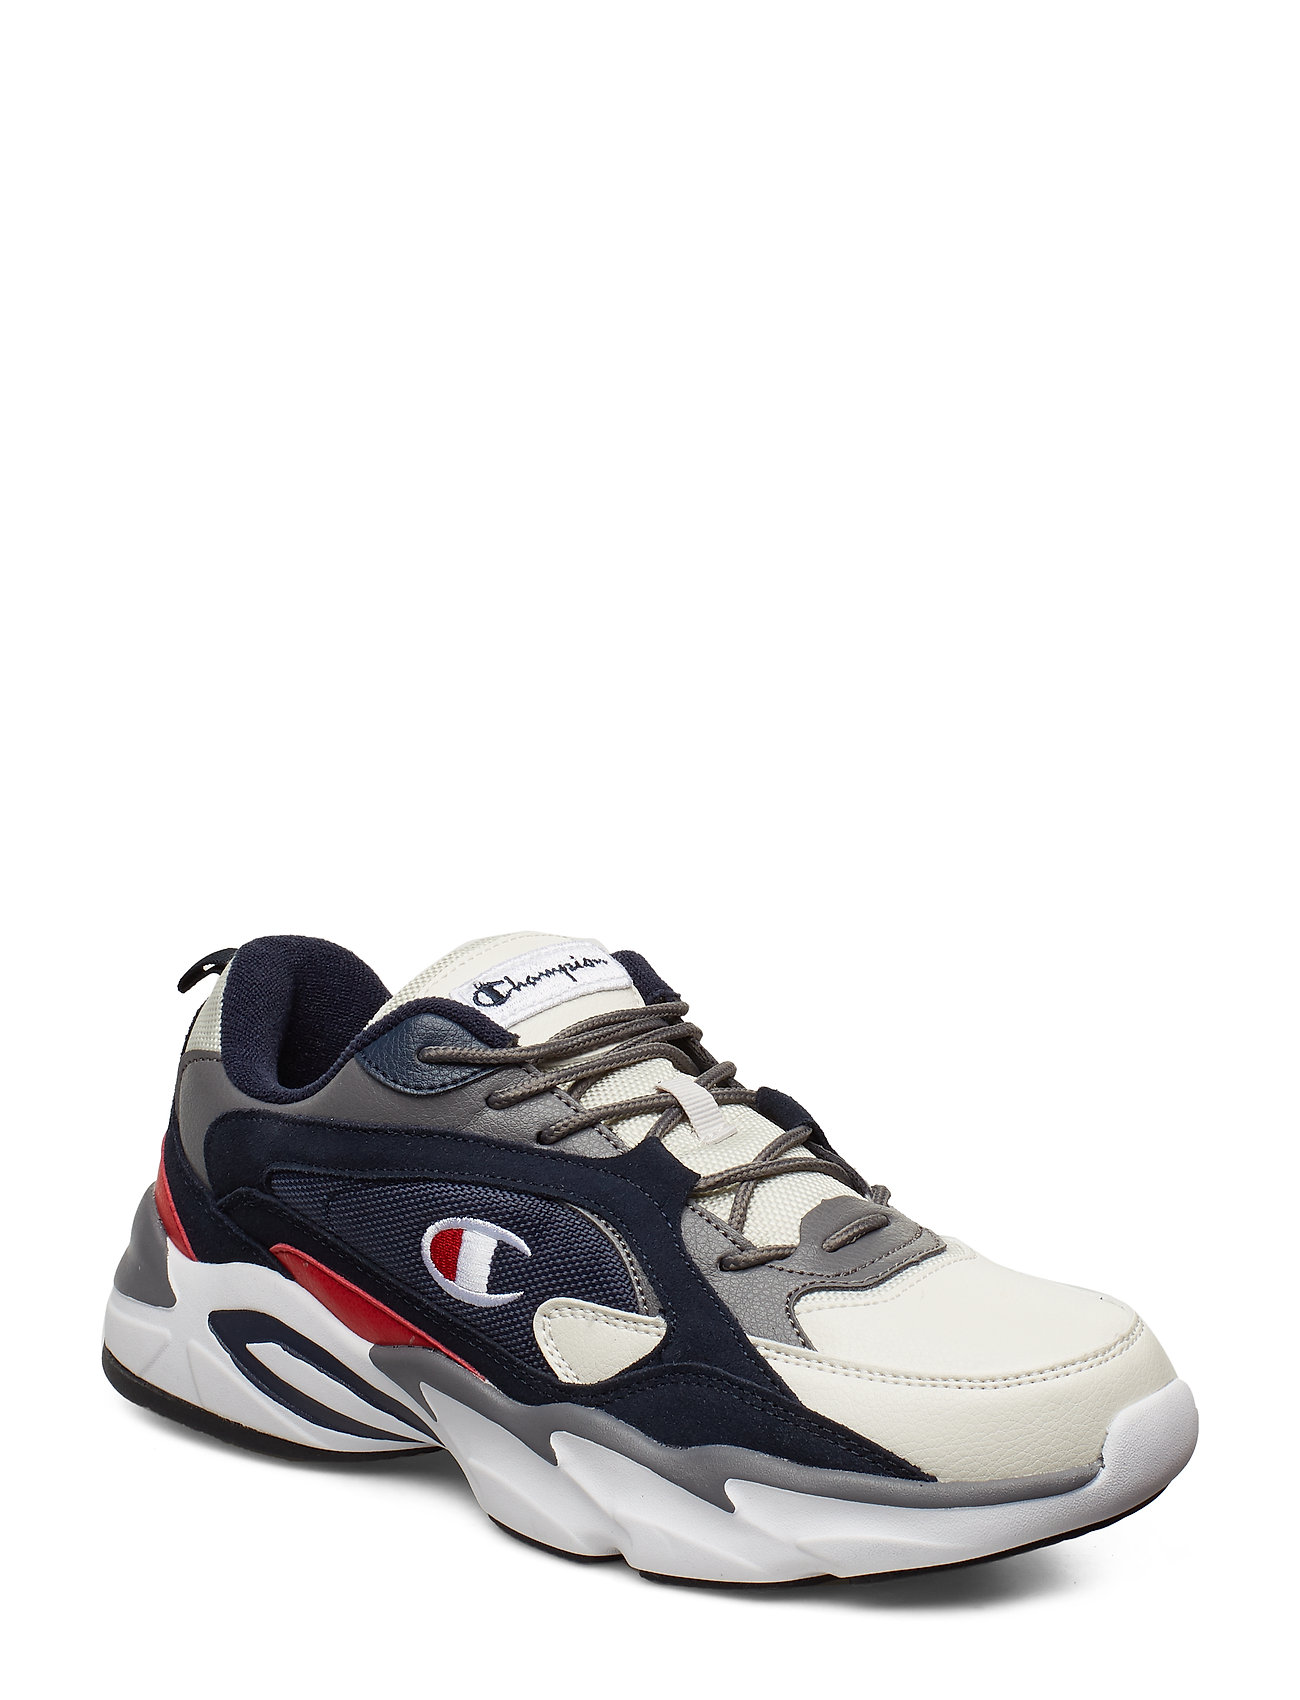 CHAMPION Low Cut Shoe Tampa Niedrige Sneaker Bunt/gemustert CHAMPION